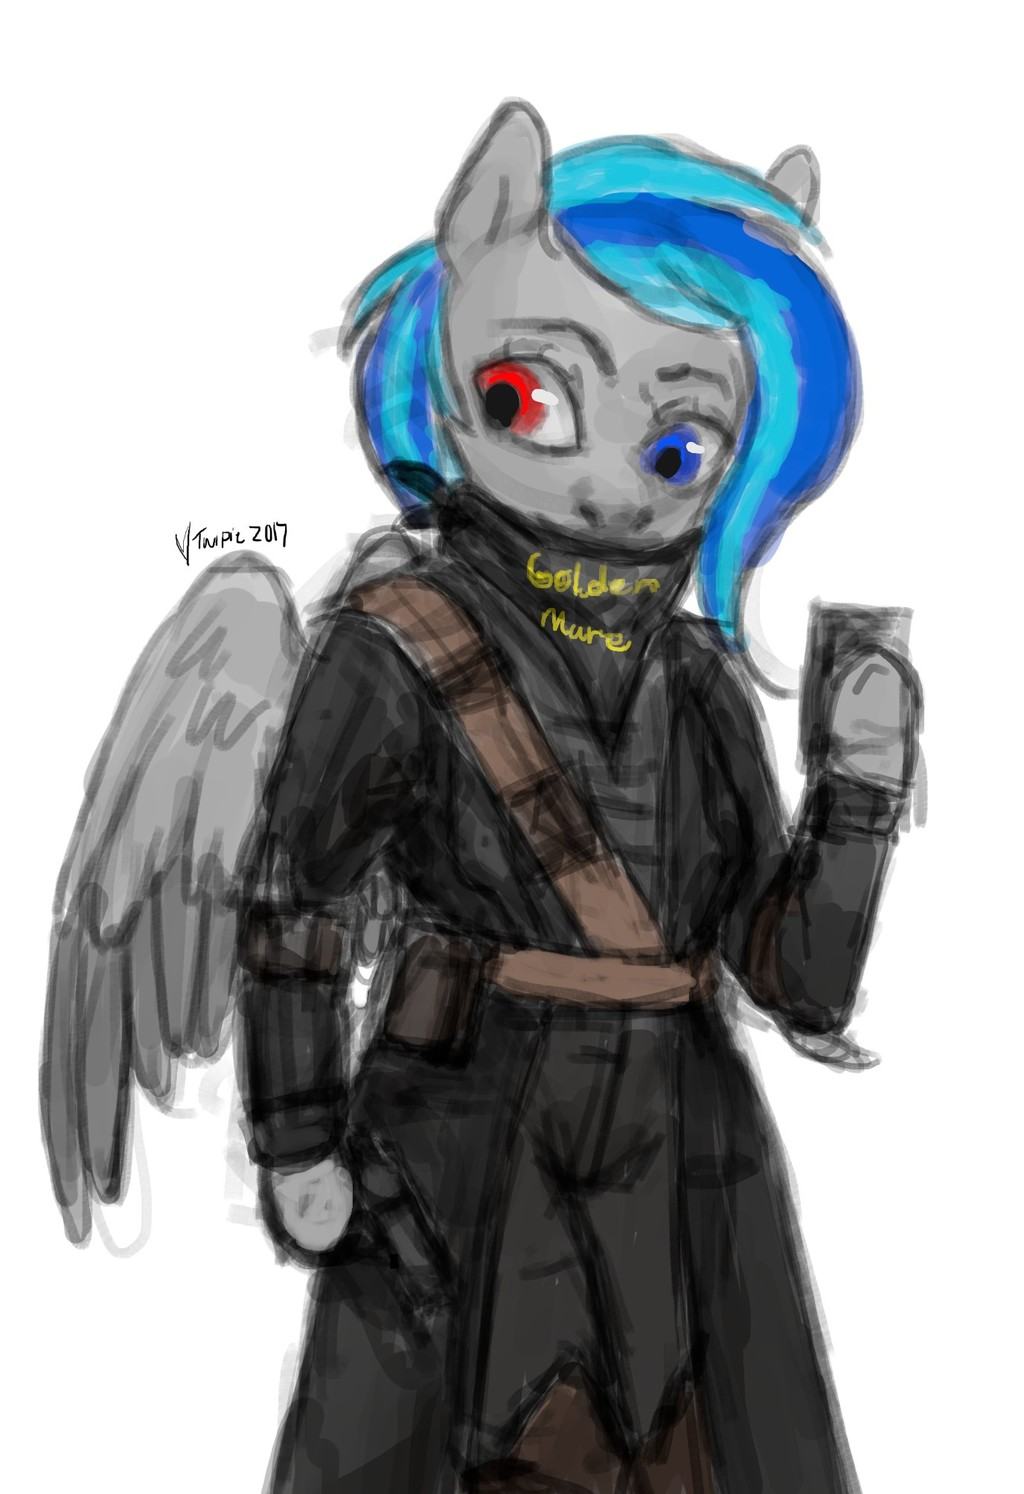 Commission for CodeBreaker